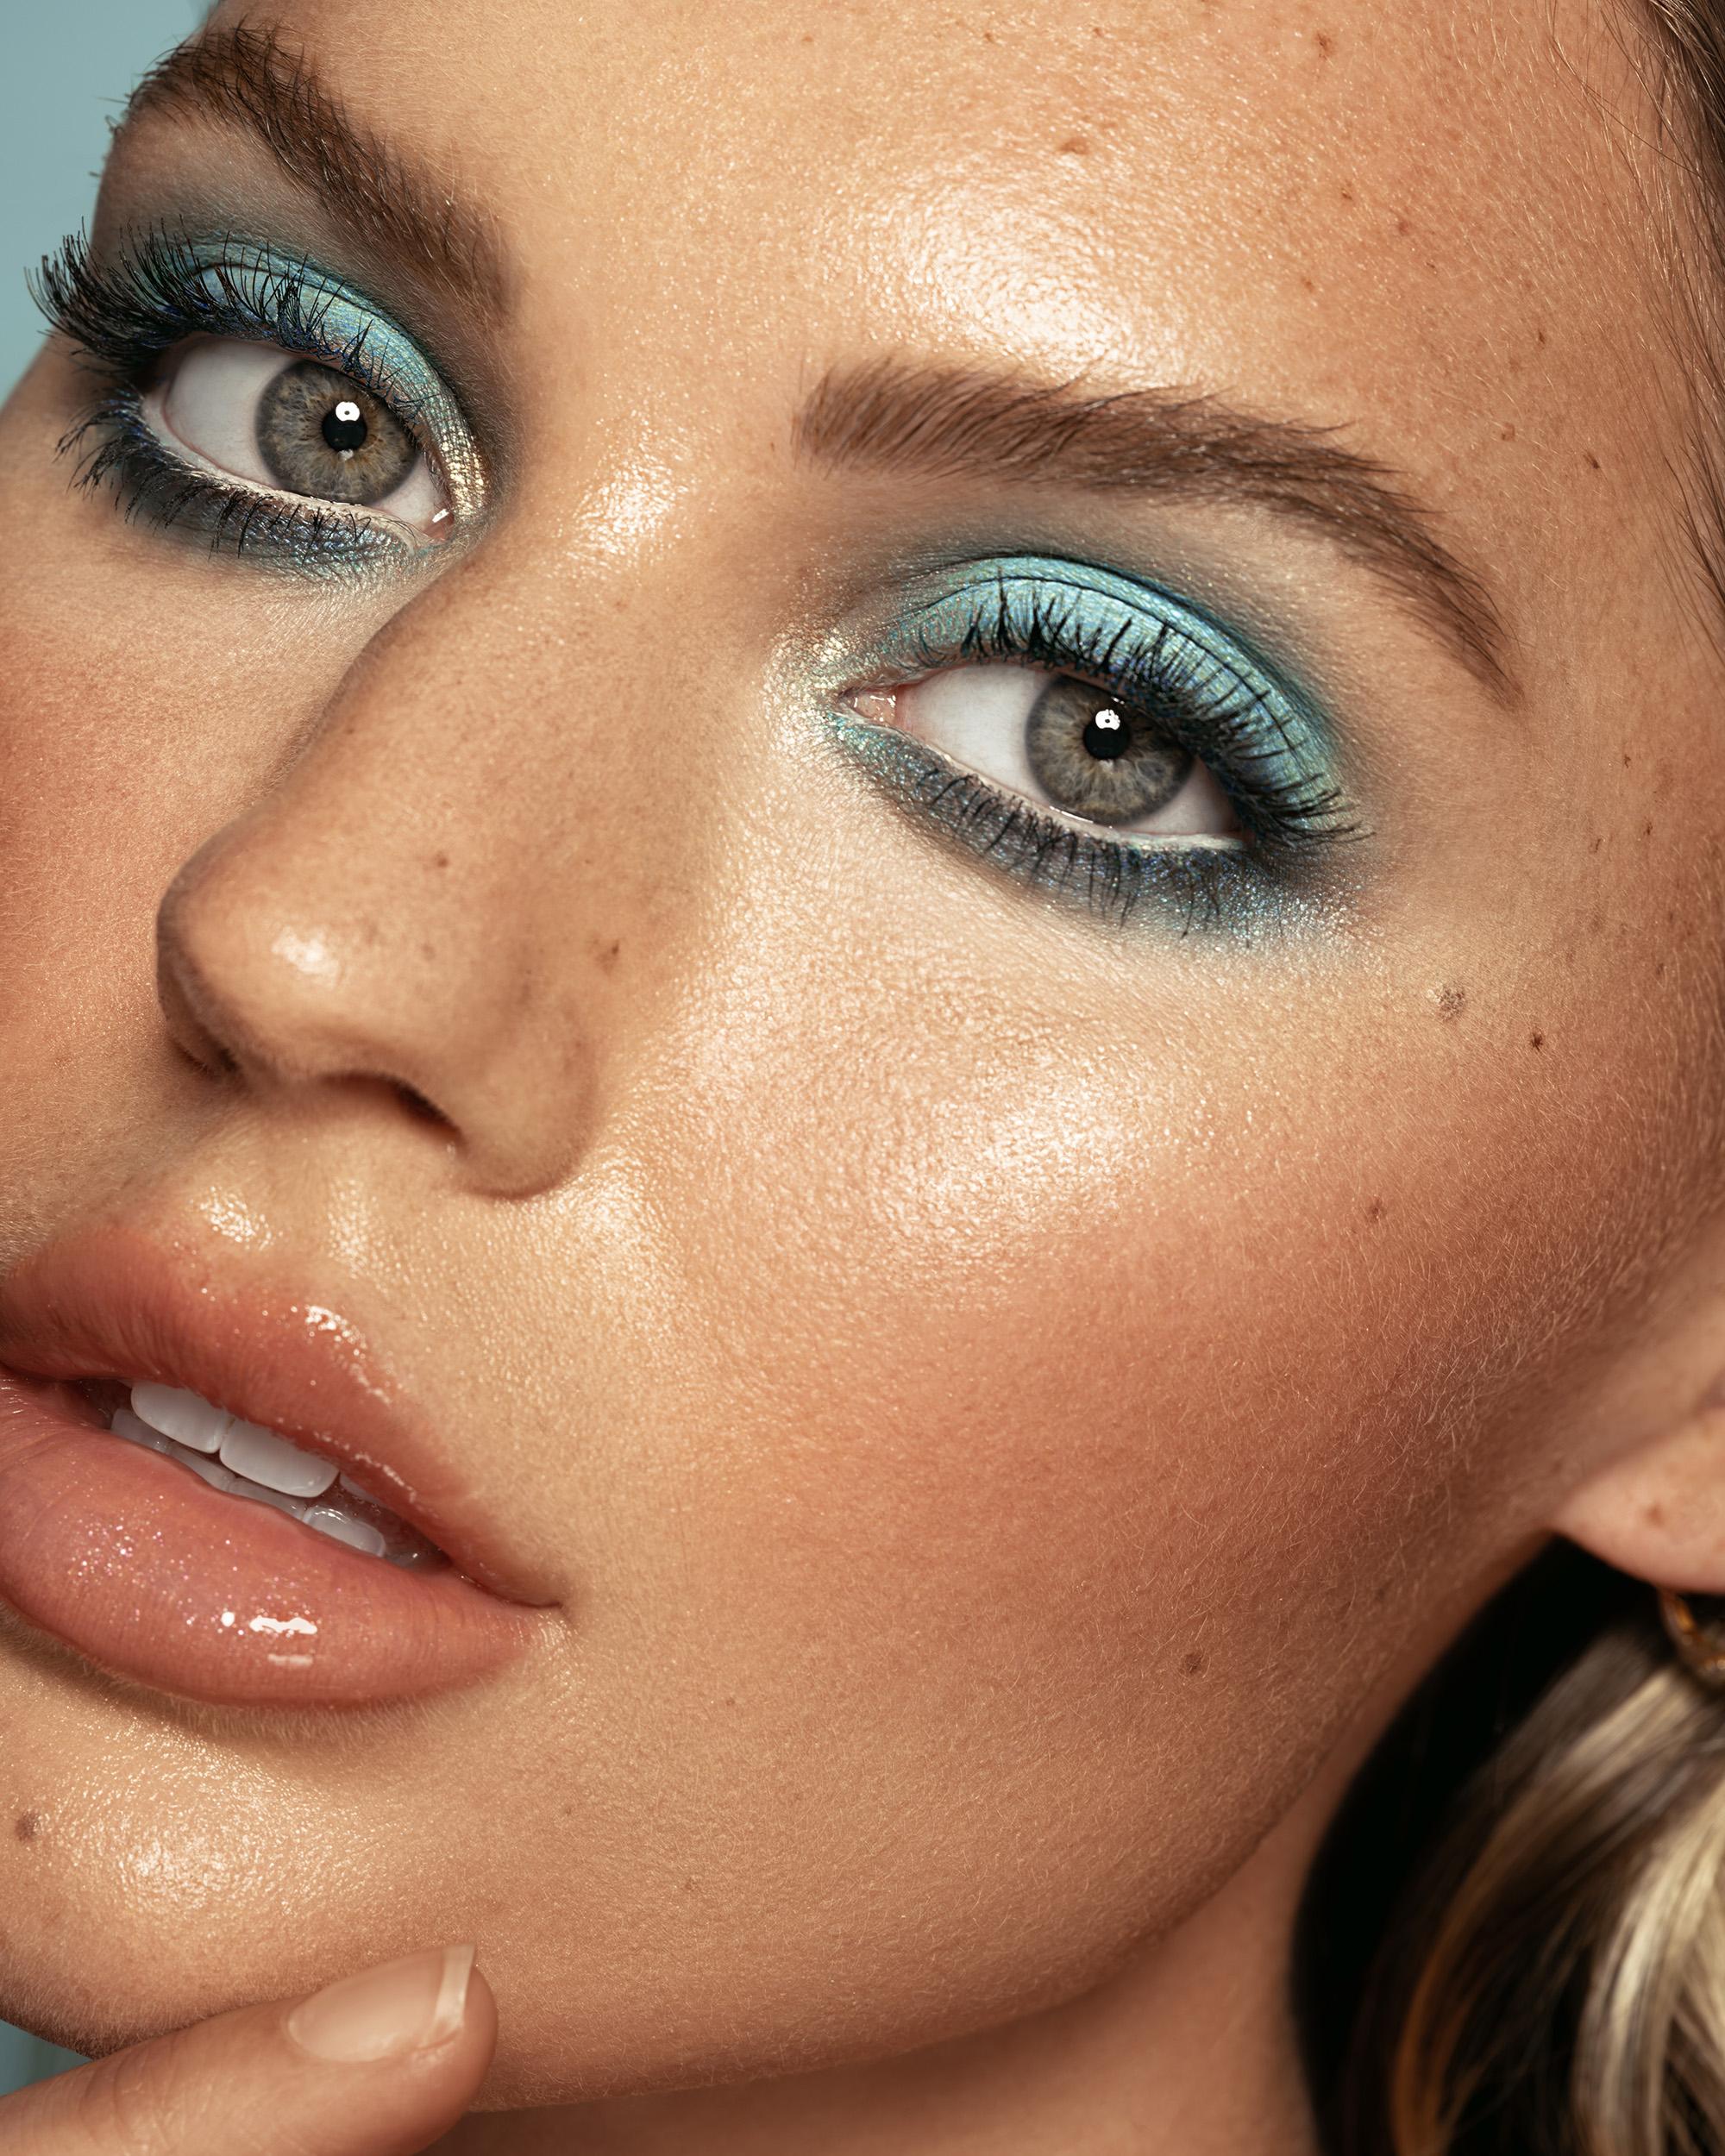 beauty-Beauty-Photography-Los-Angeles-Sarah-Wohl-2